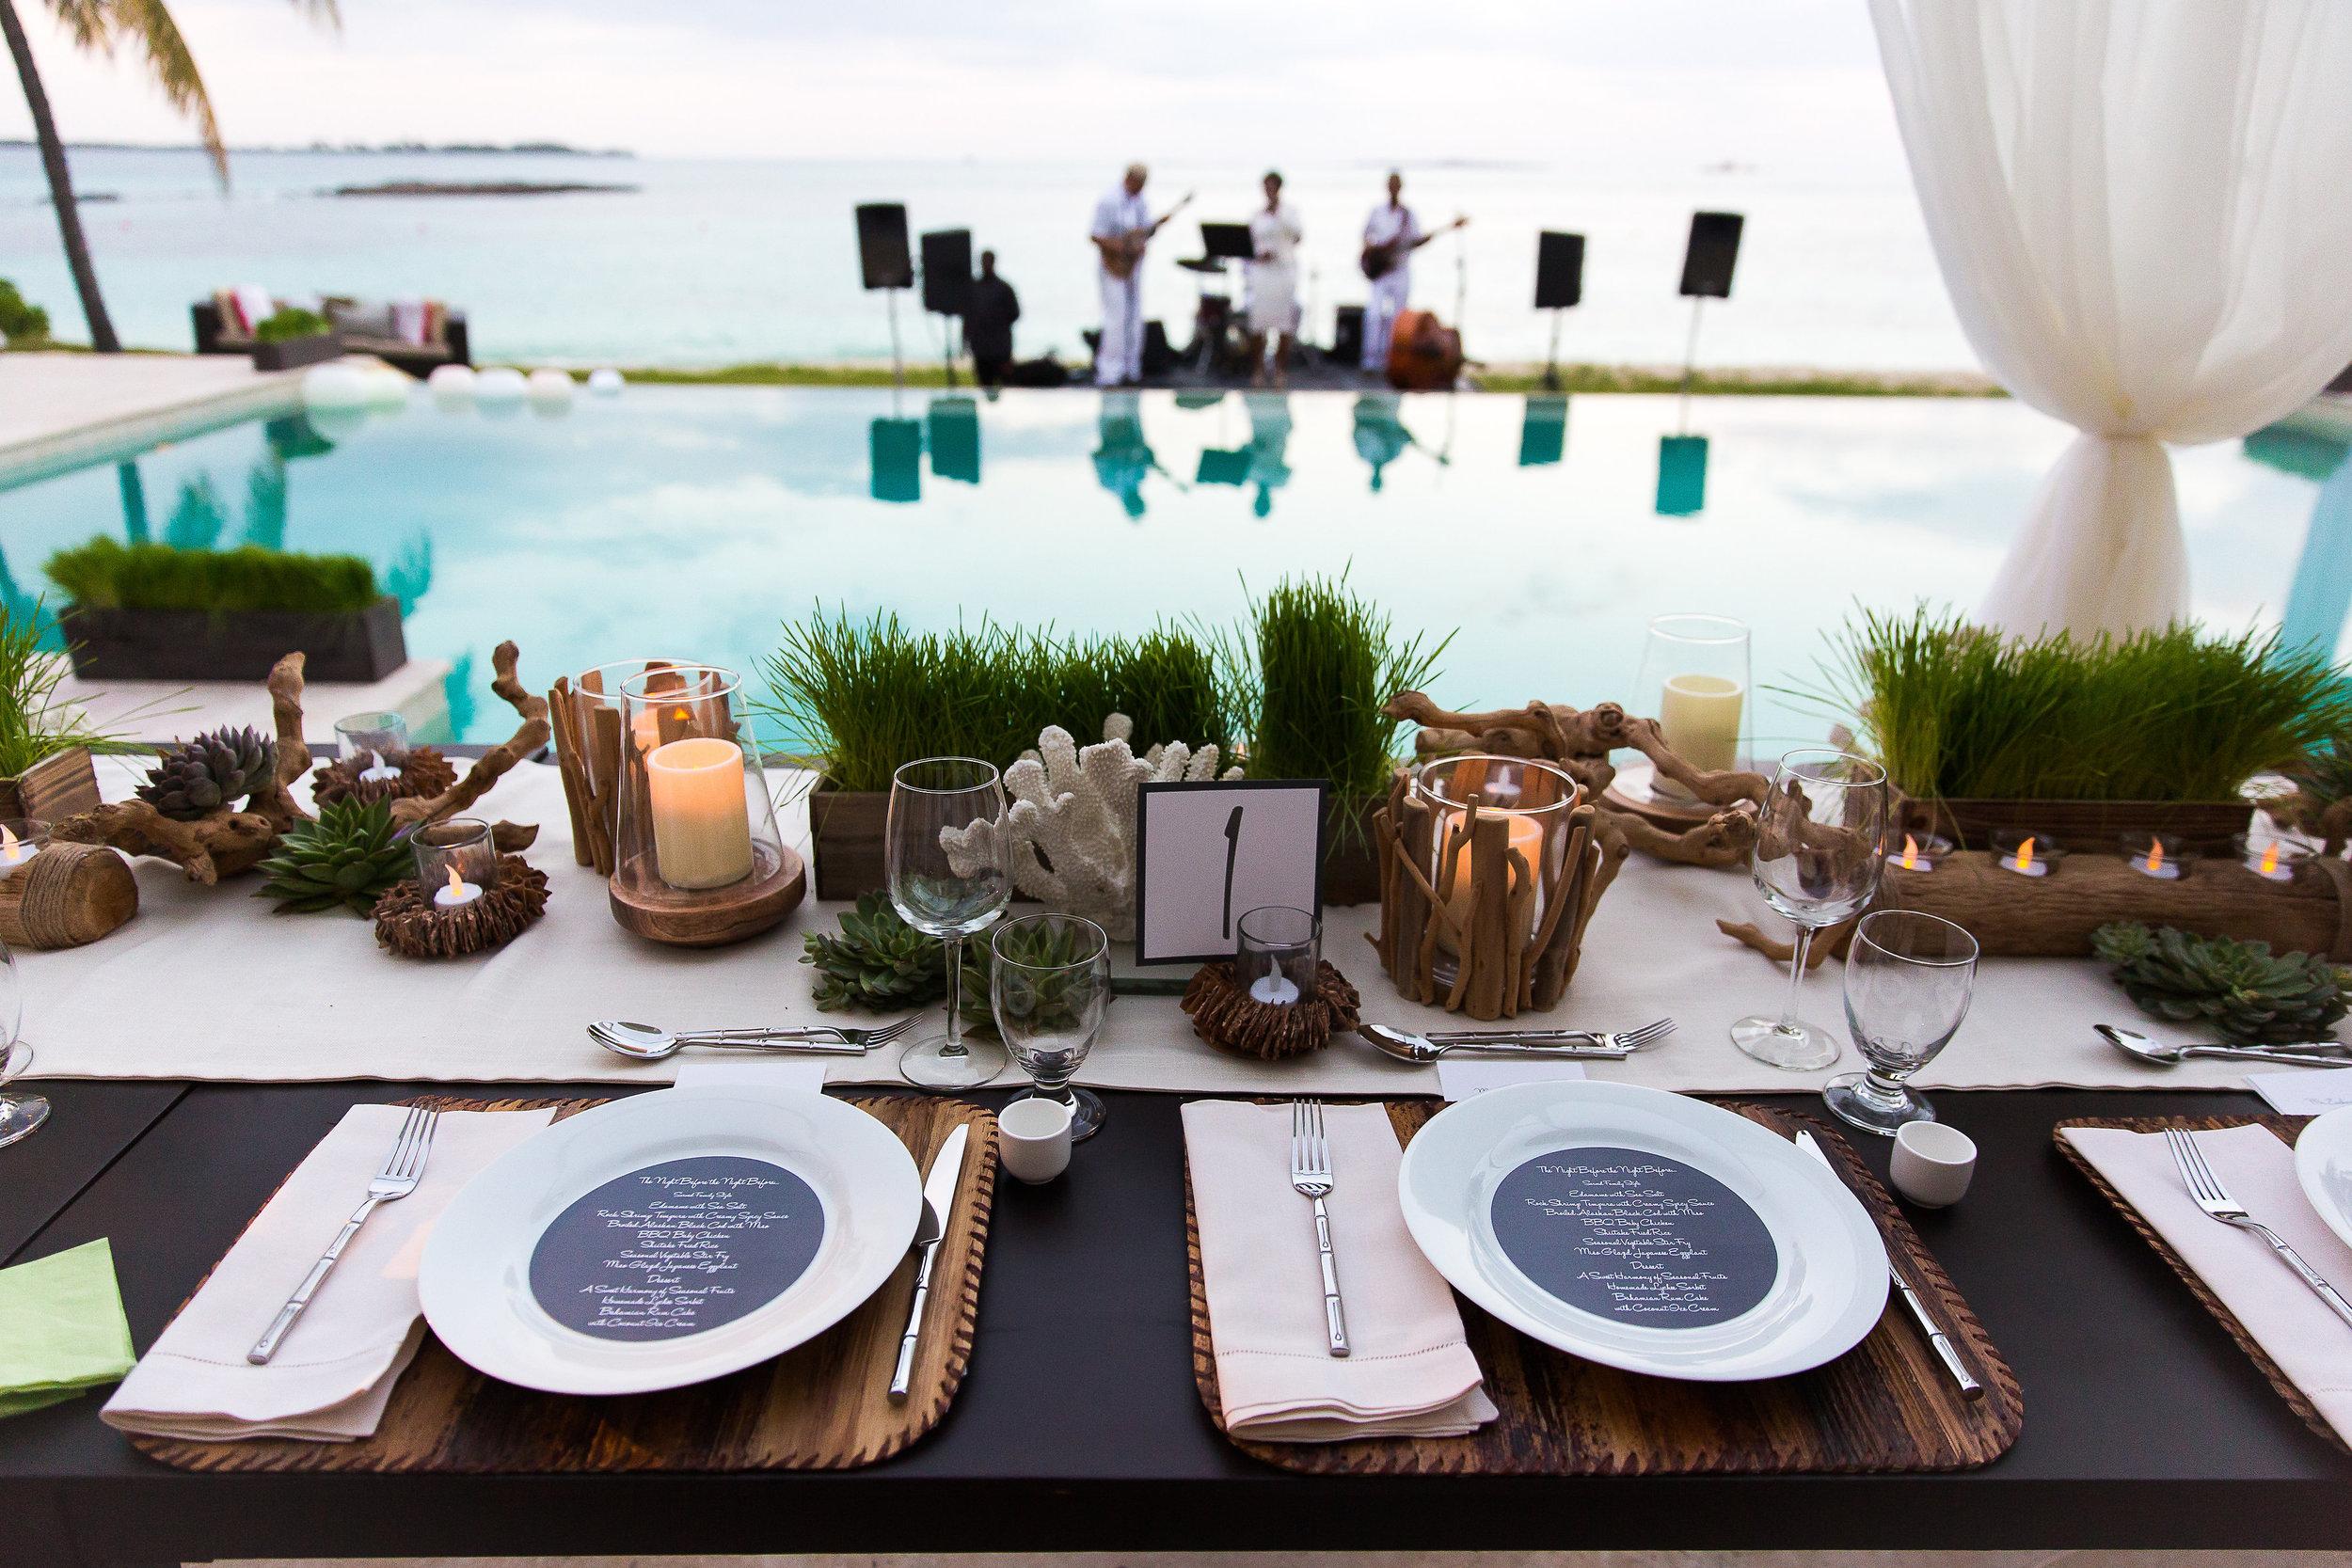 Ceci_New_York_Ceci_Style_Ceci_Johnson_Luxury_Lifestyle_Destination_Bahamas_Wedding_Letterpress_Inspiration_Design_Custom_Couture_Personalized_Invitations_7.jpg